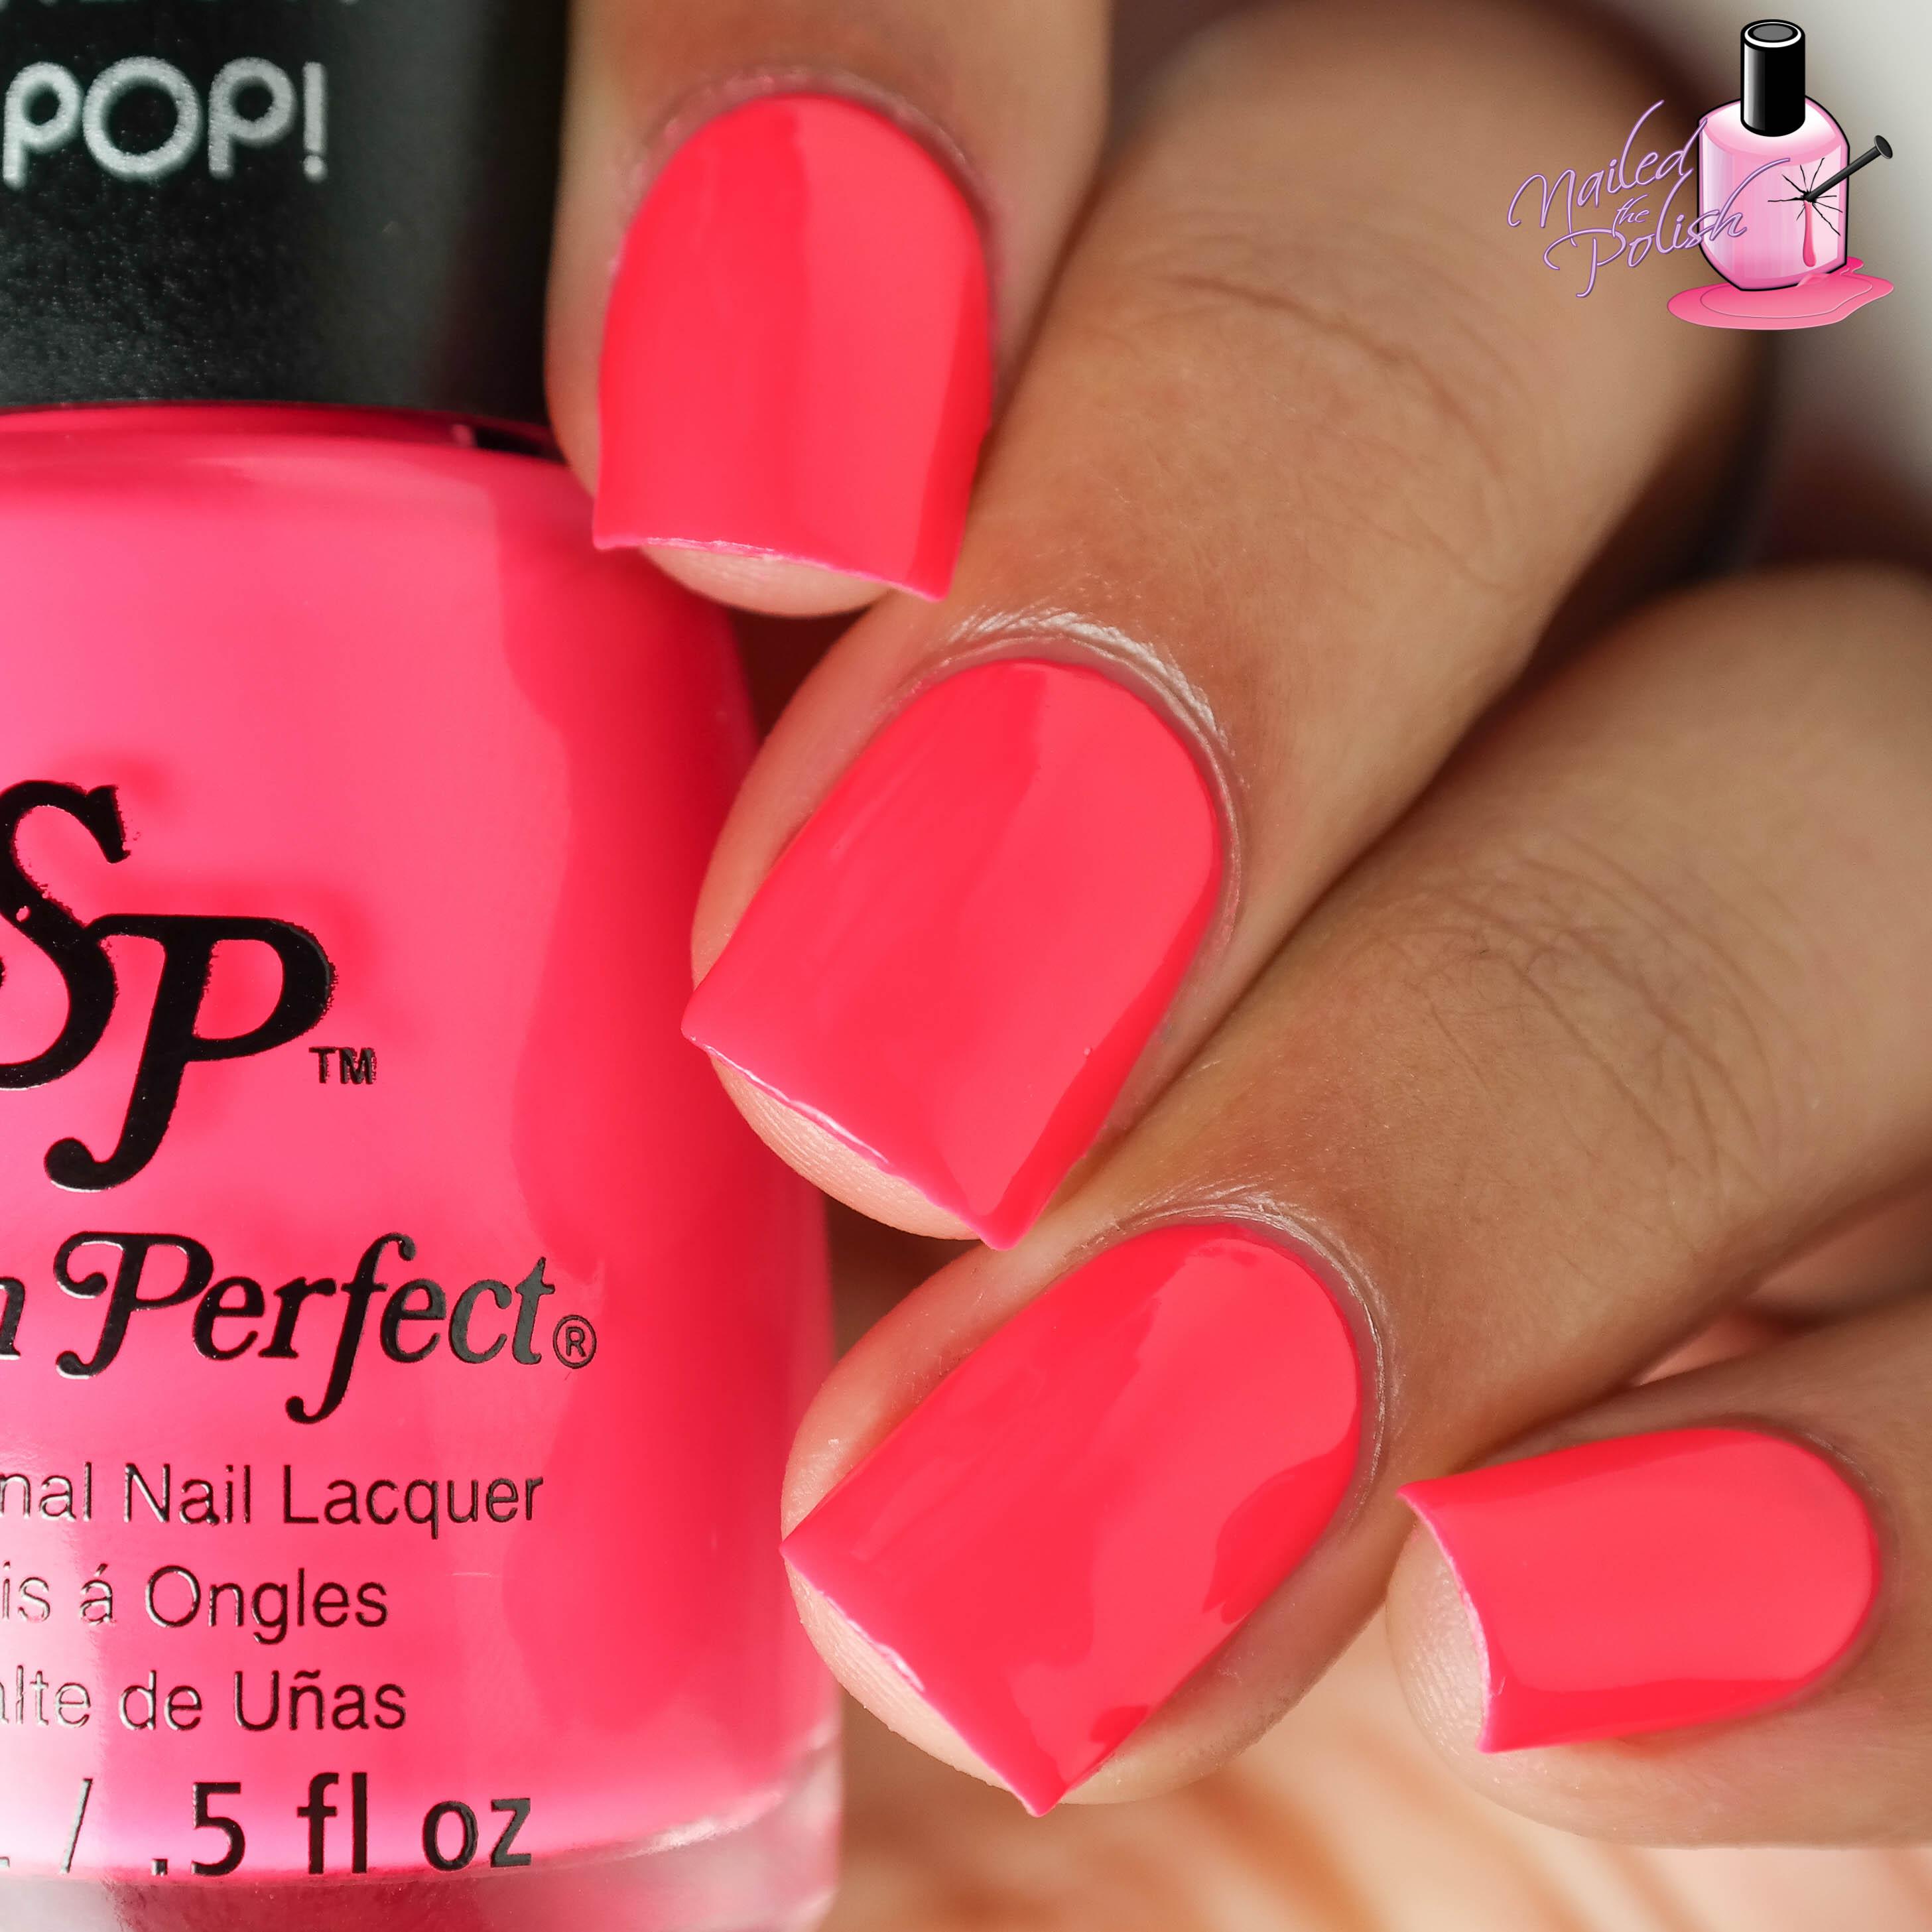 Salon Perfect Neon Pop! Collection   nailedthepolish